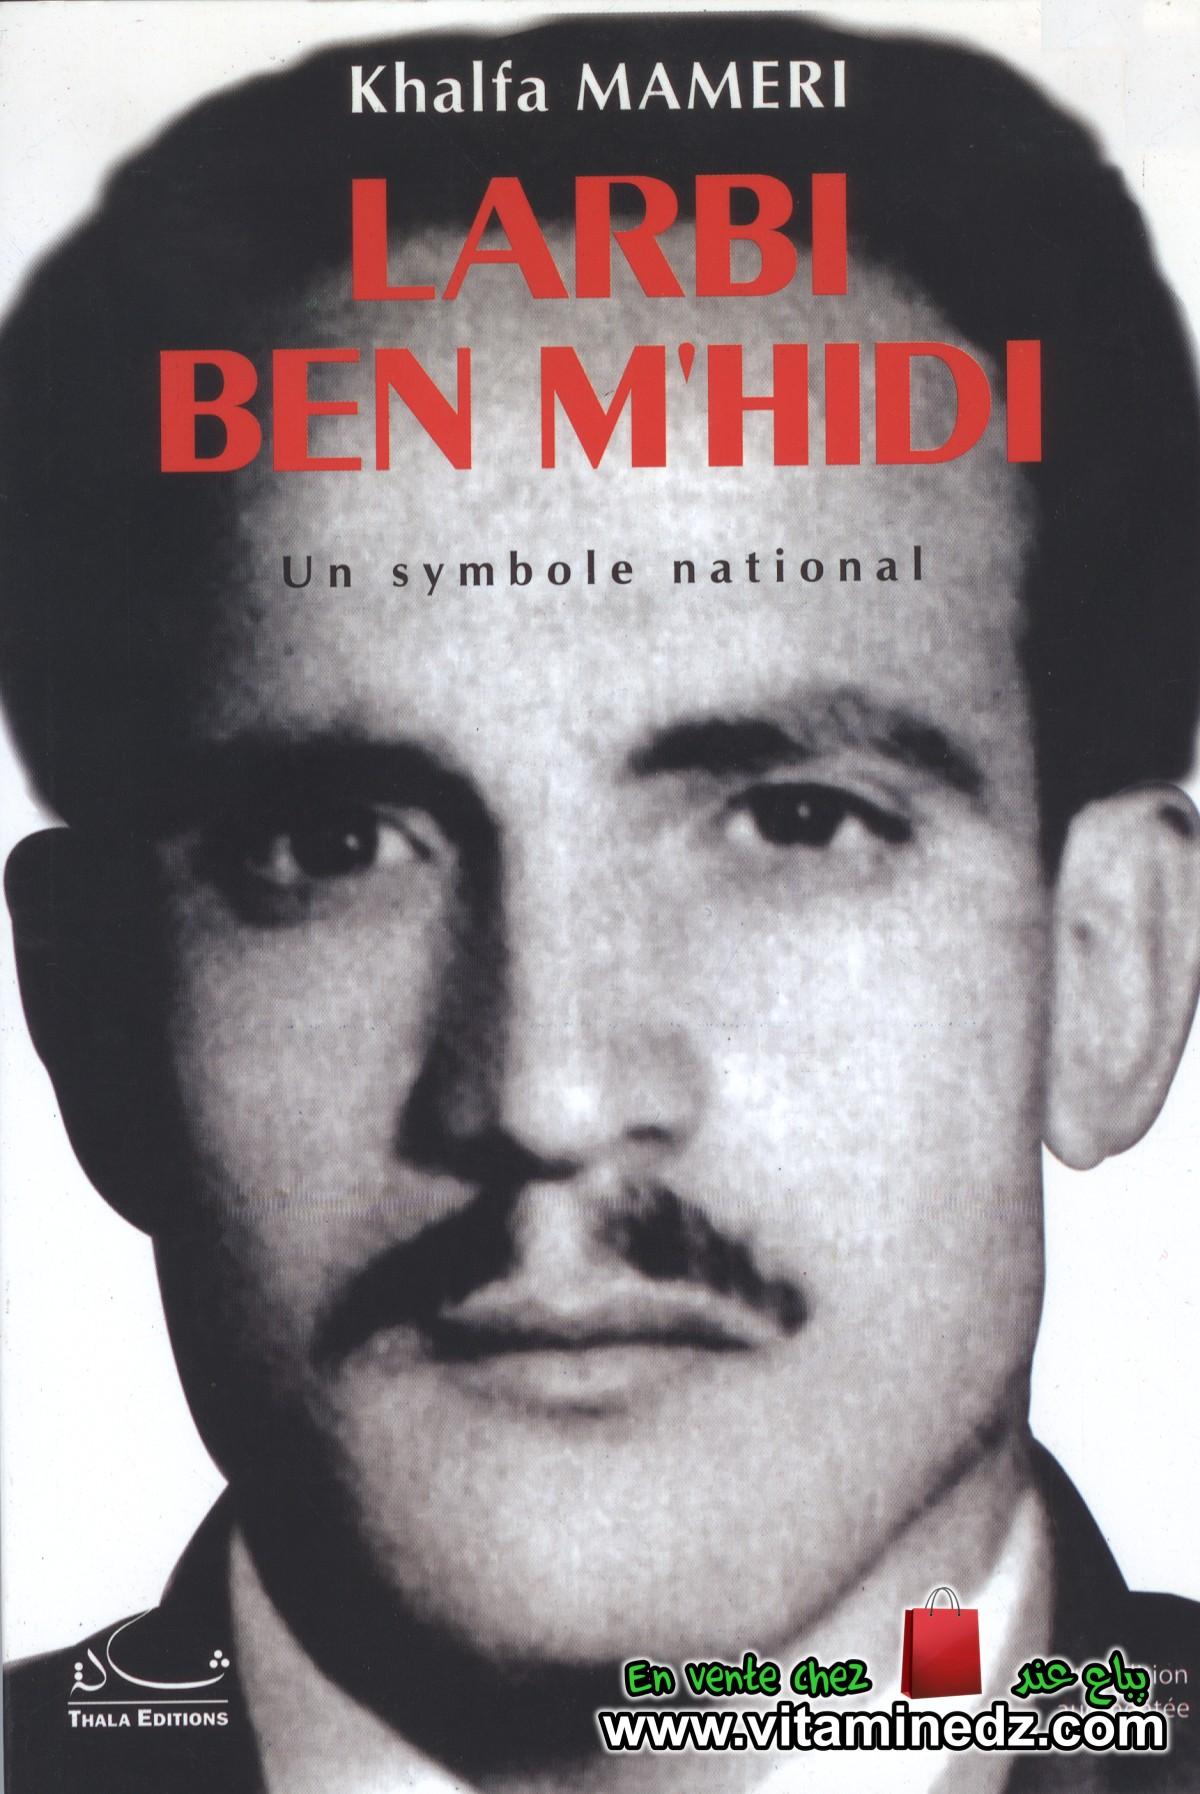 Khalfa Mameri - Larbi Ben M'hidi, un symbole national